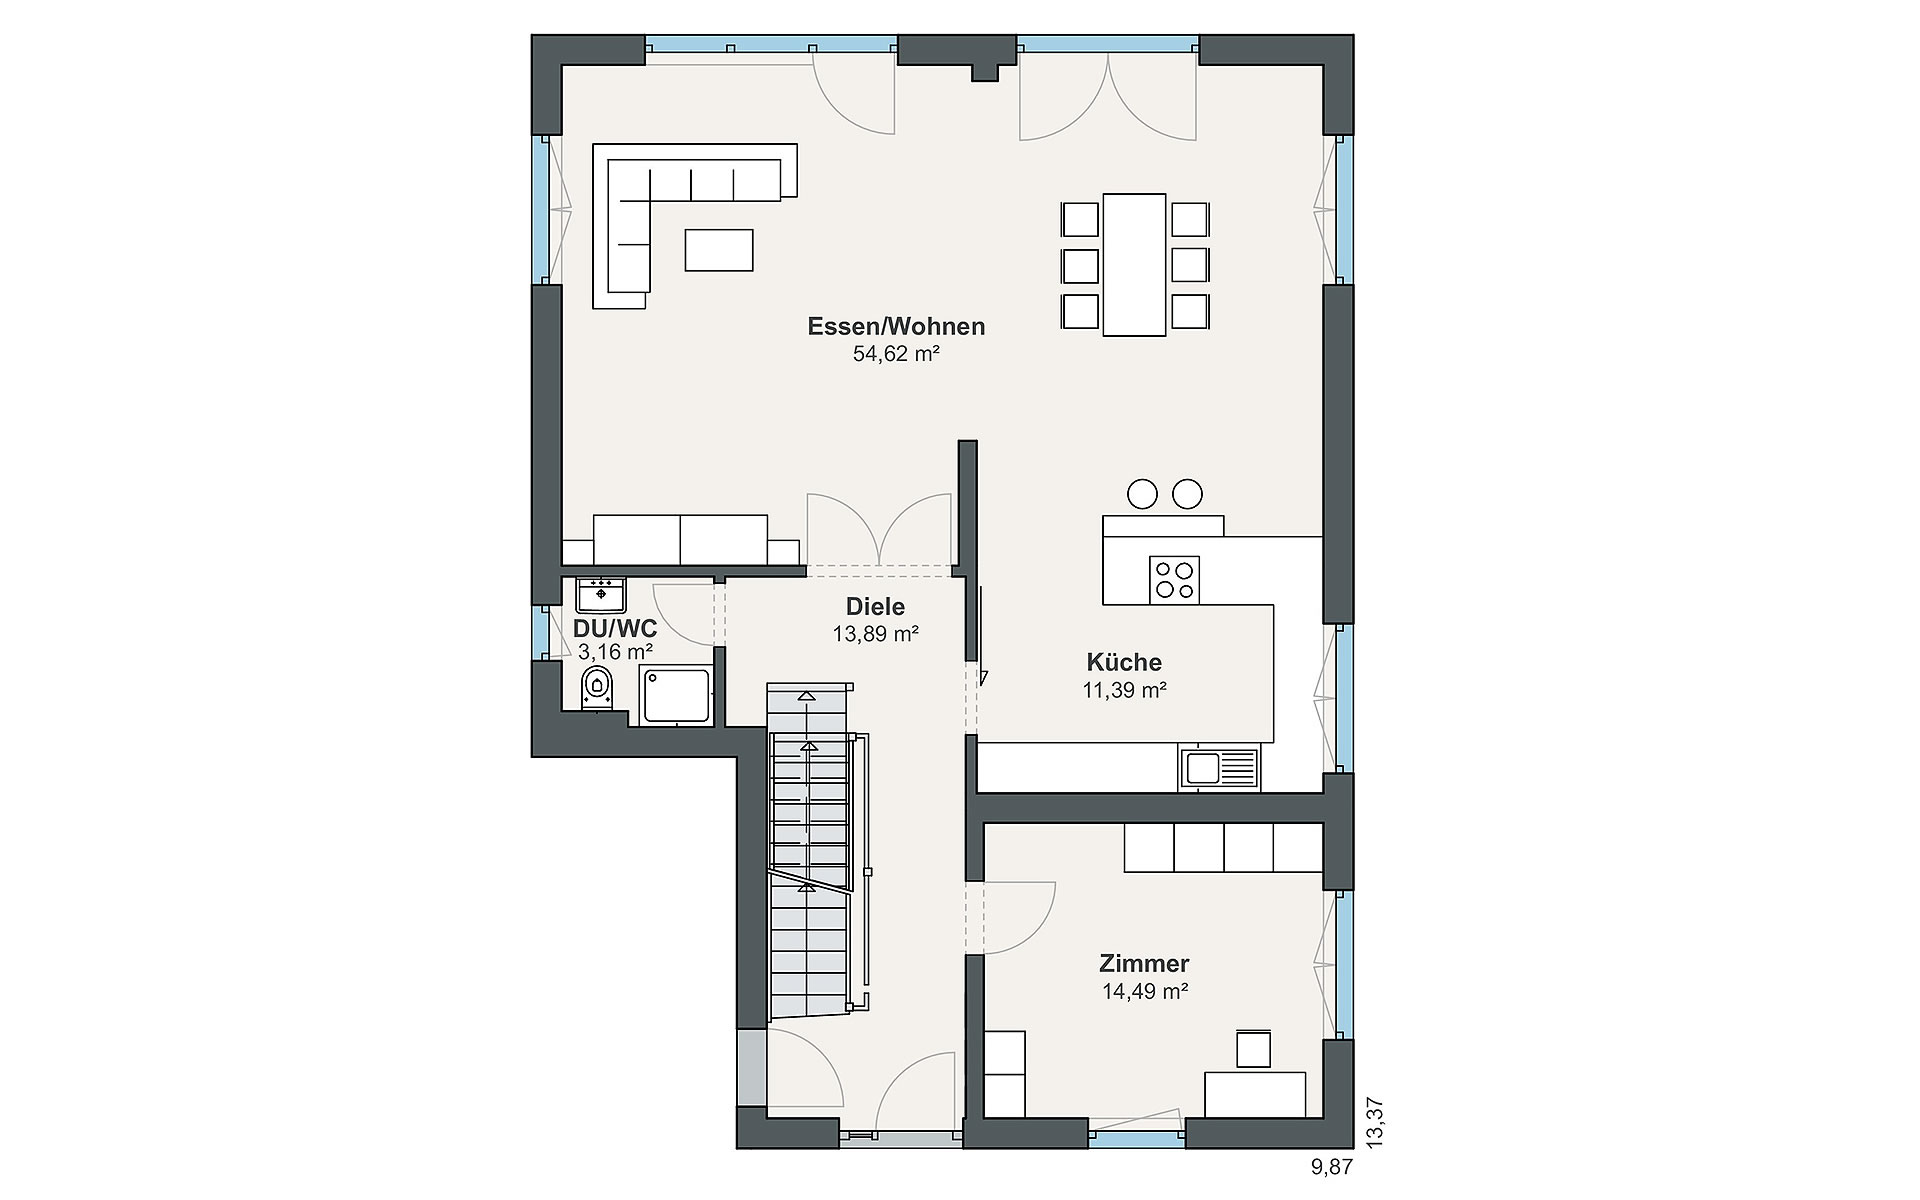 Erdgeschoss Individual (Greve) von WeberHaus GmbH & Co. KG